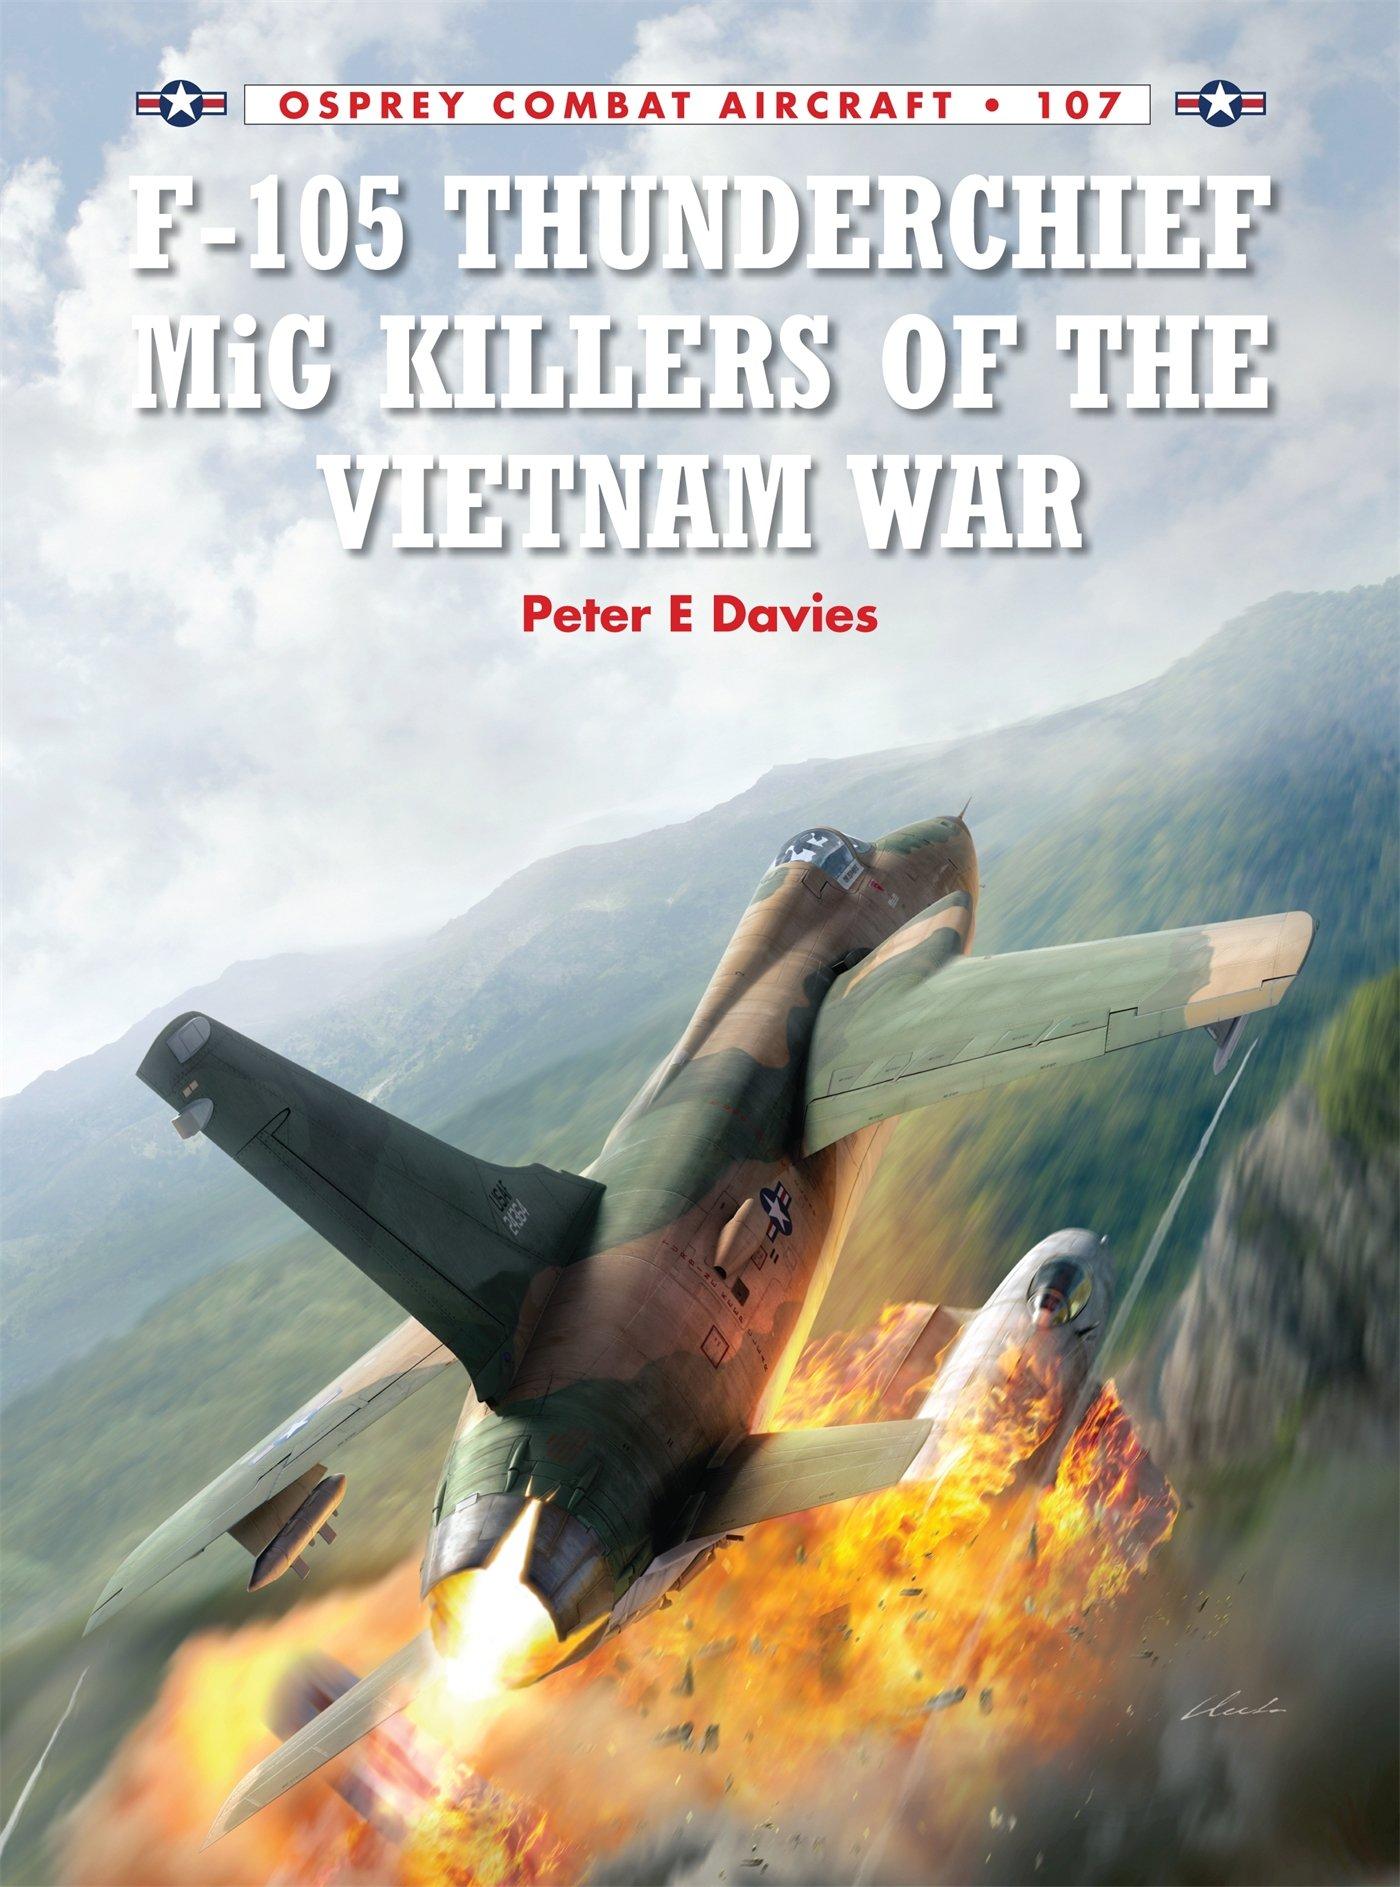 F-105 Thunderchief Units of the Vietnam War (Combat Aircraft)